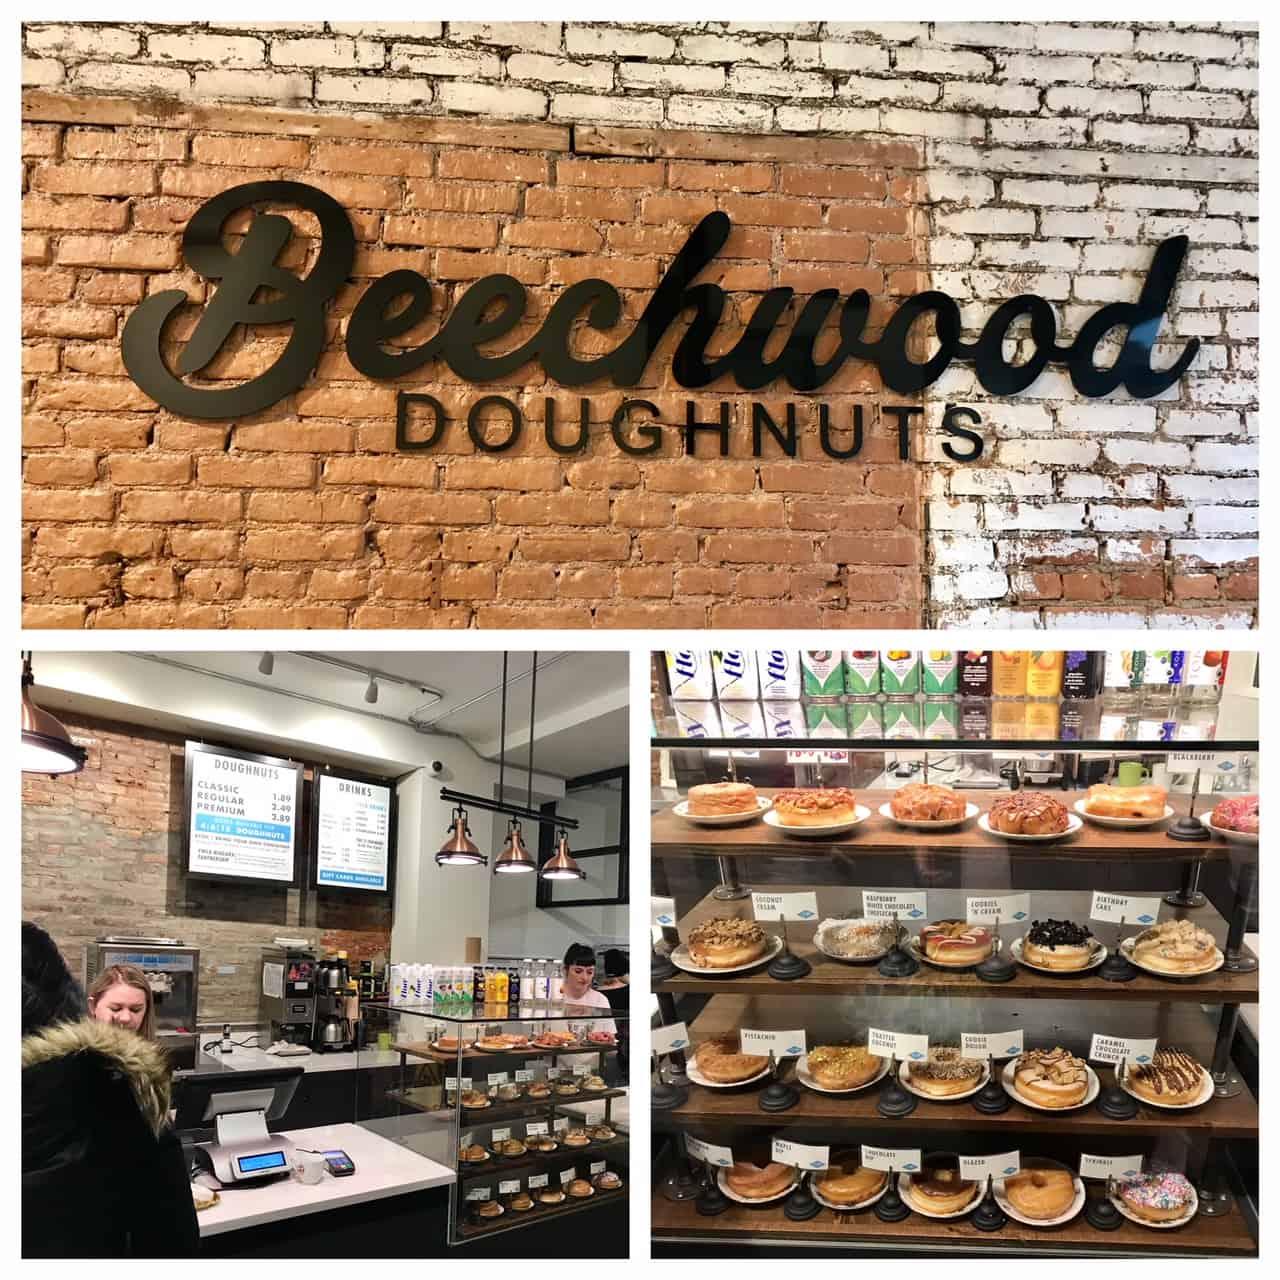 Beechwood Doughnuts